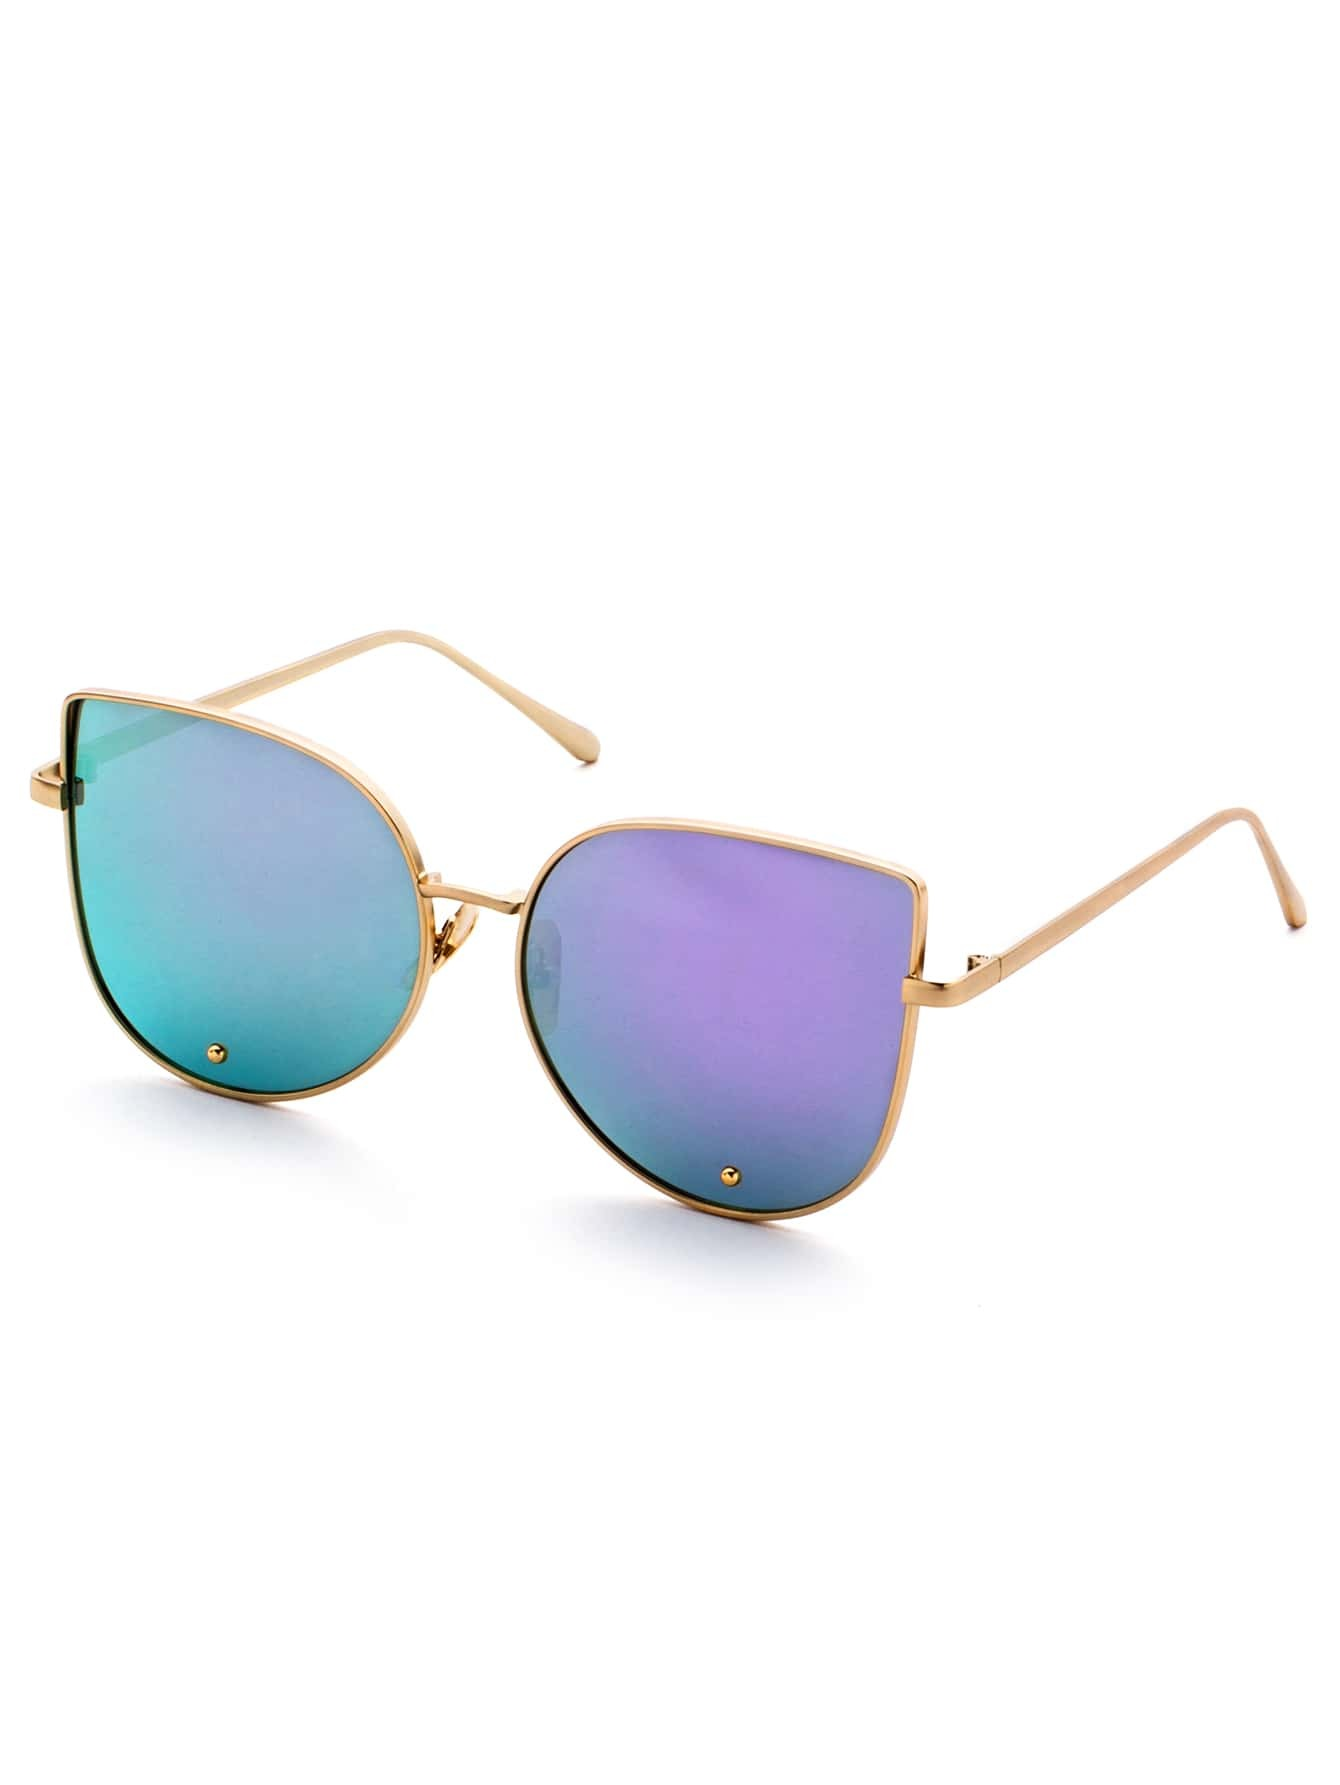 Gold Frame Cat Eye Sunglasses : Gold Frame Purple Cat Eye Stylish Sunglasses